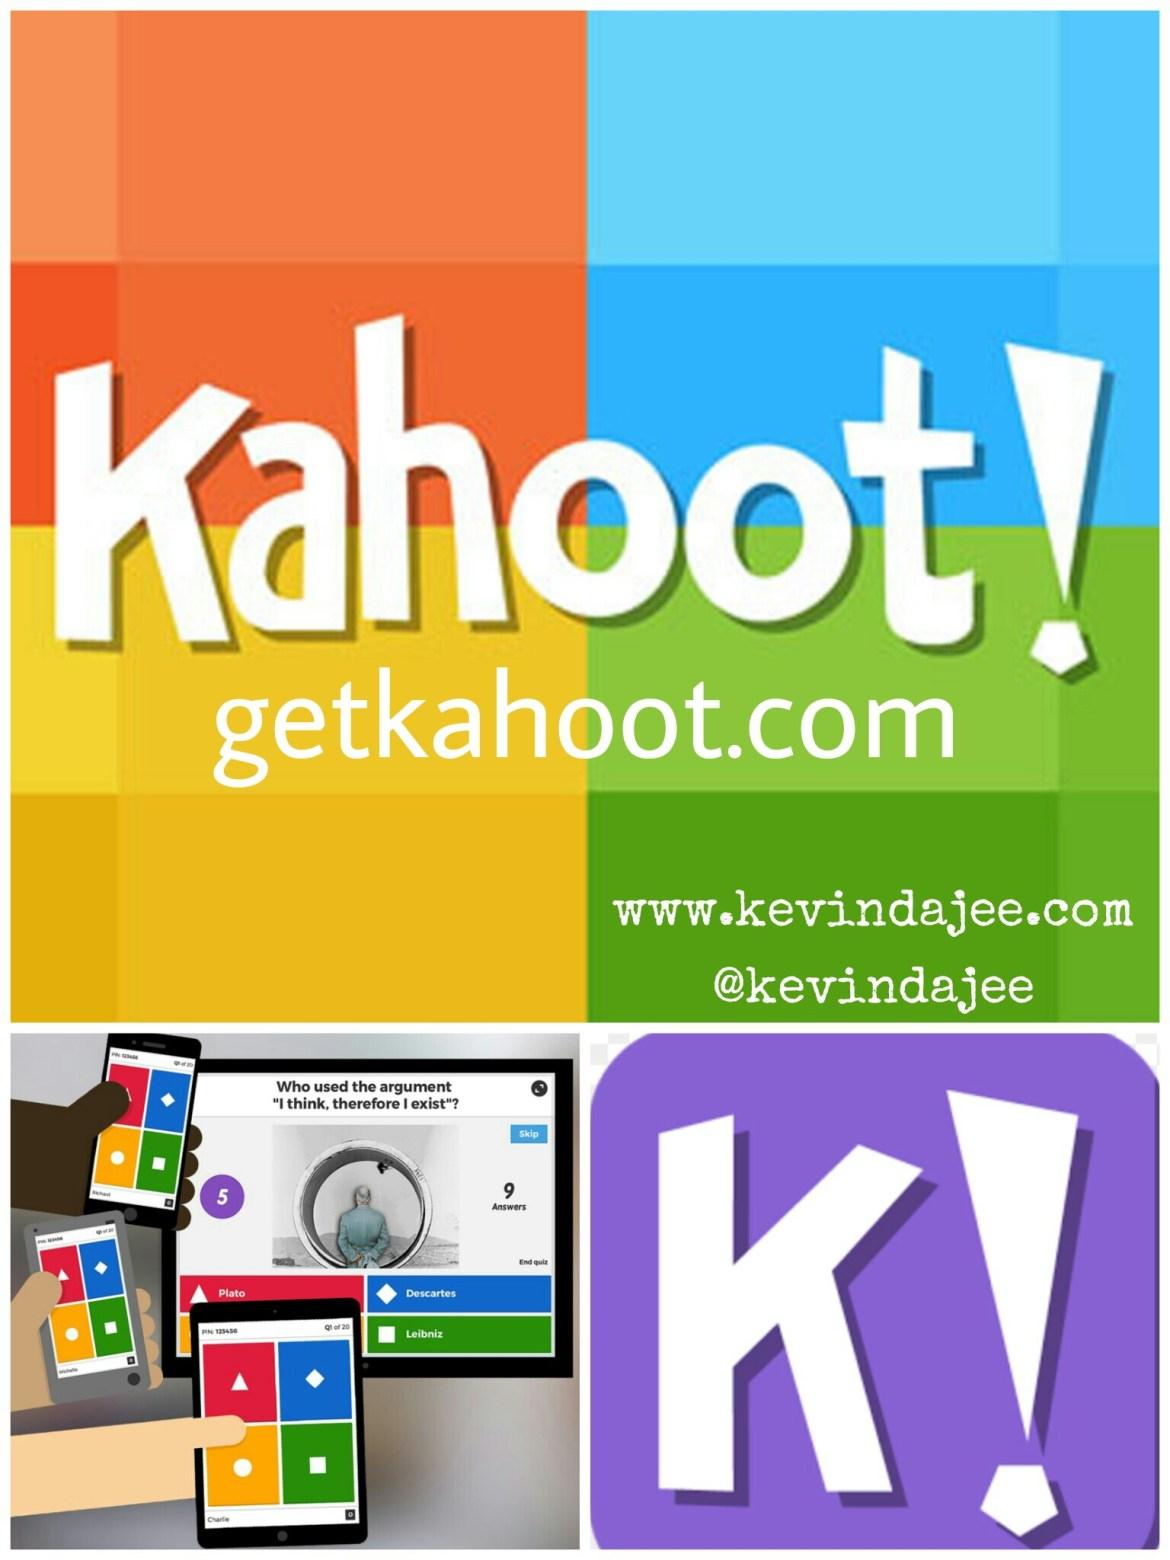 kahoot - photo #3